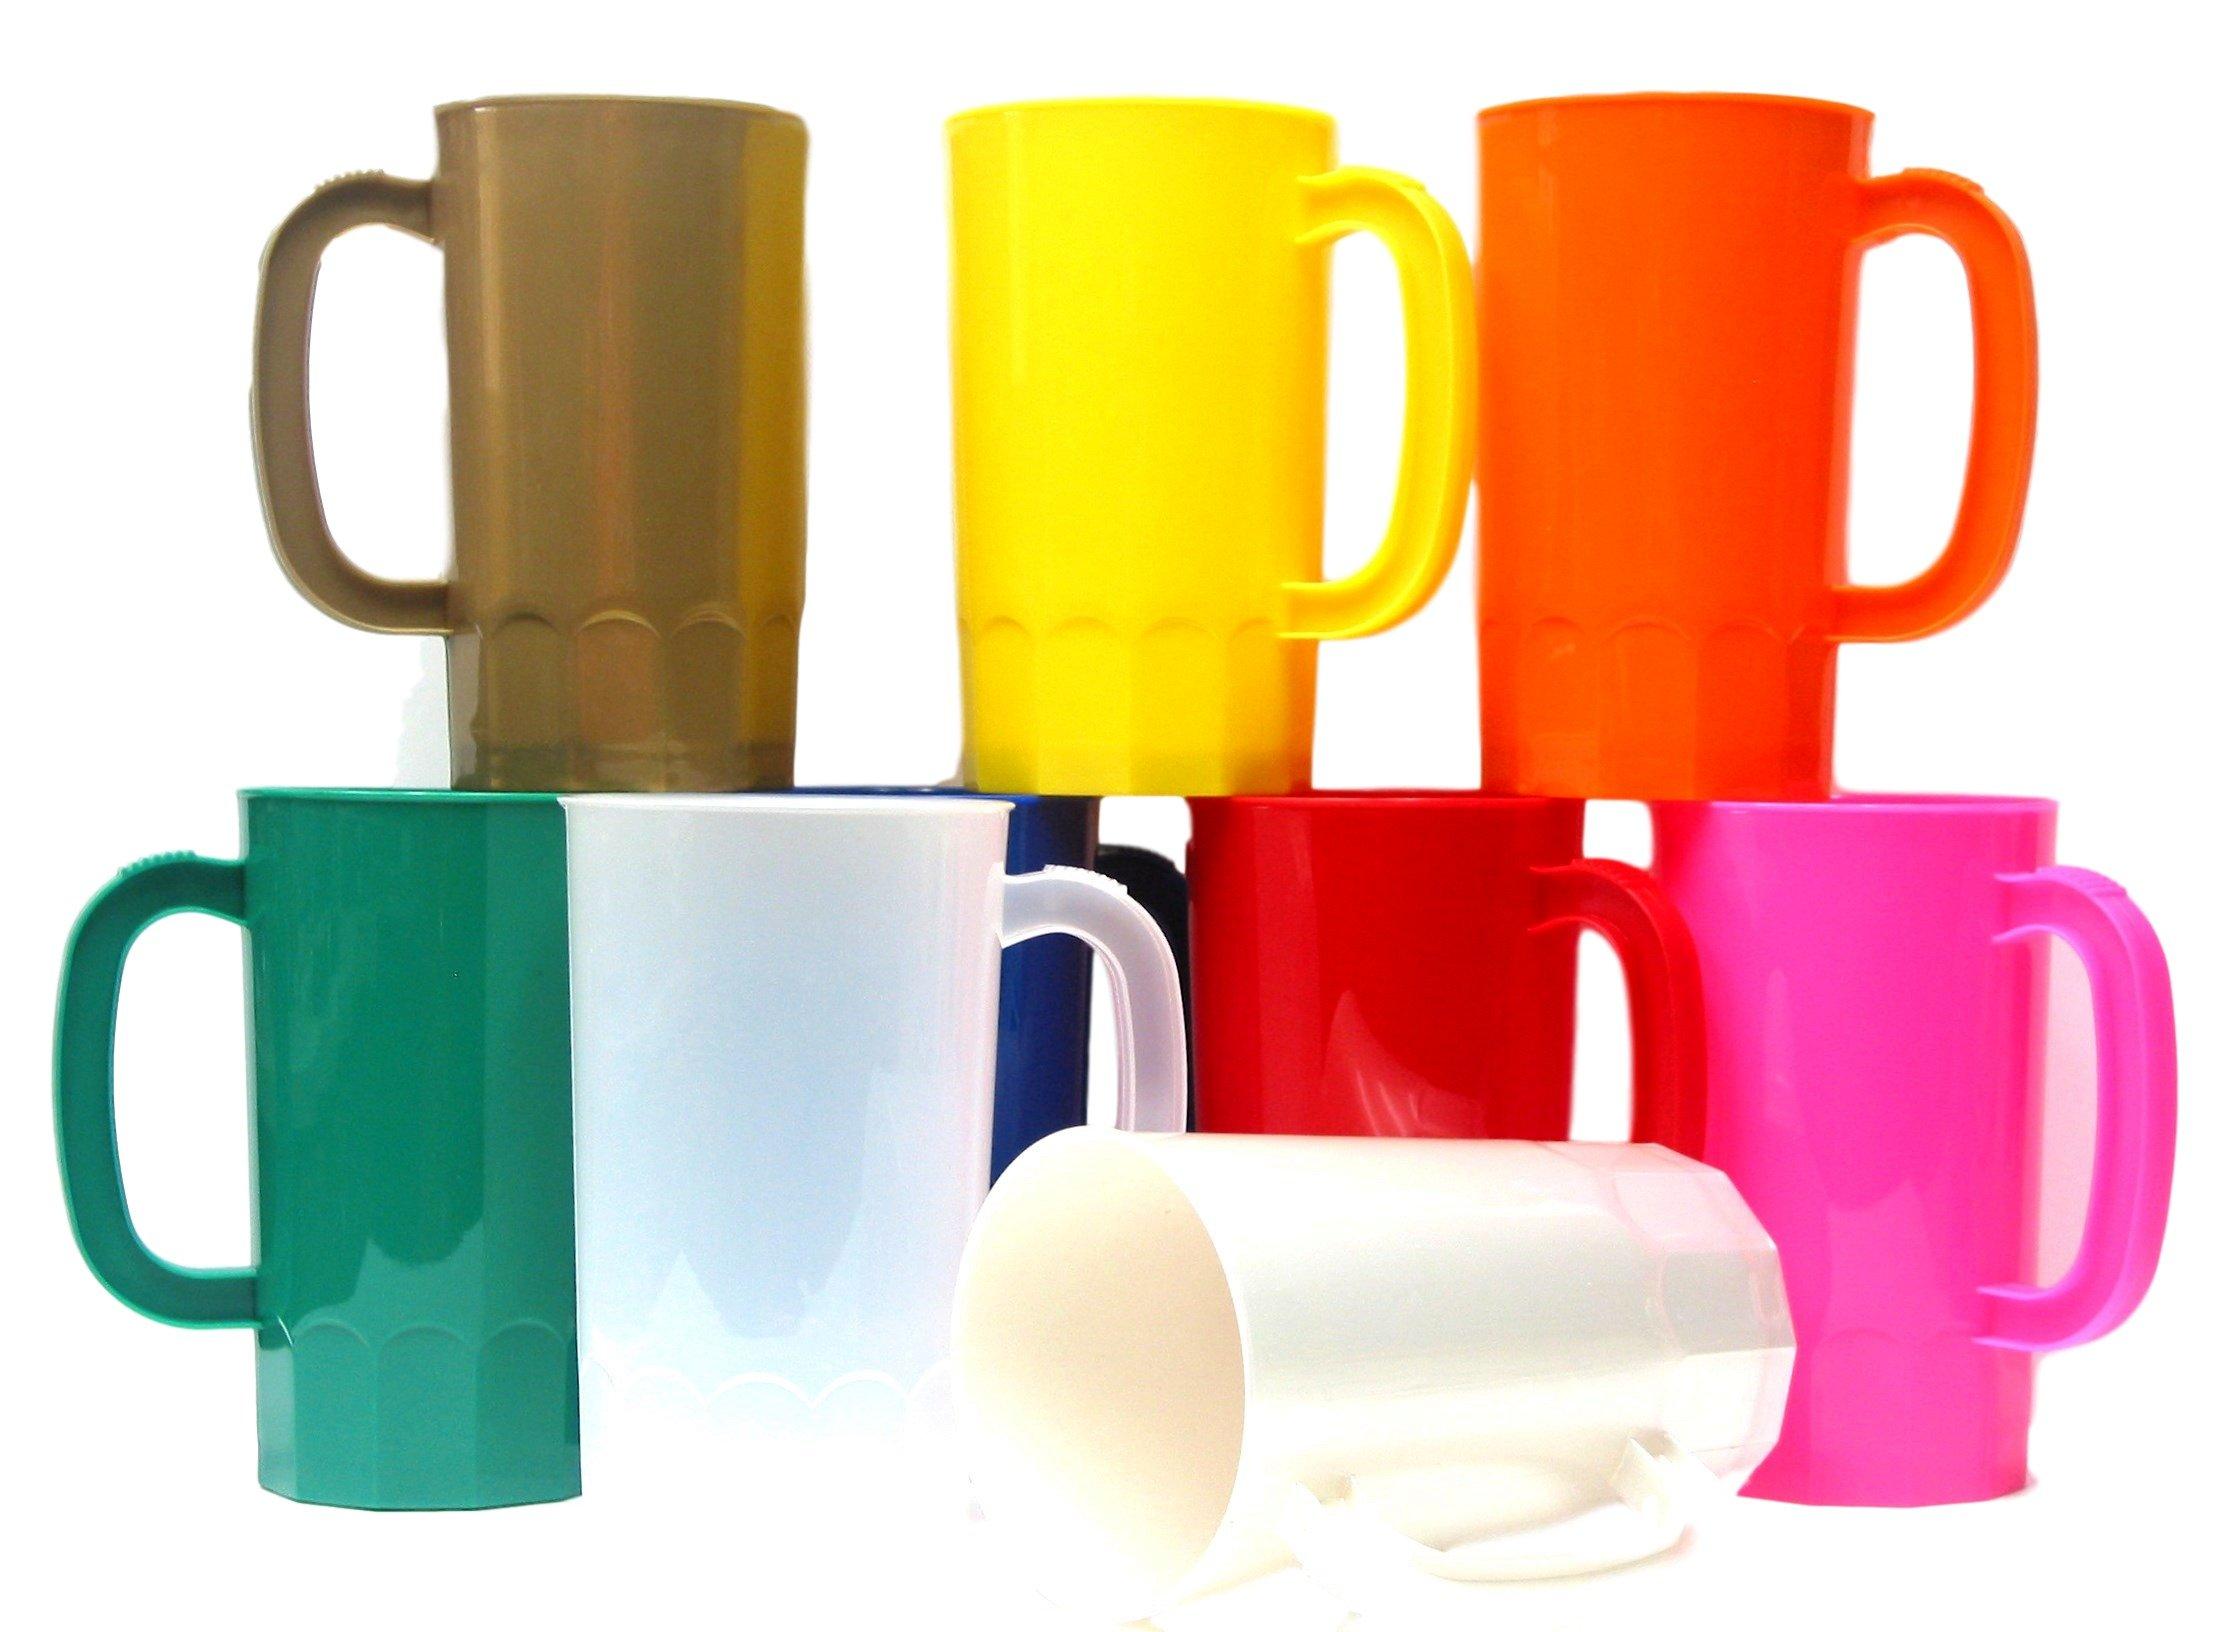 Talisman, Plastic Beer Mugs, Large 32 Ounce, Pack 9, Color Multi